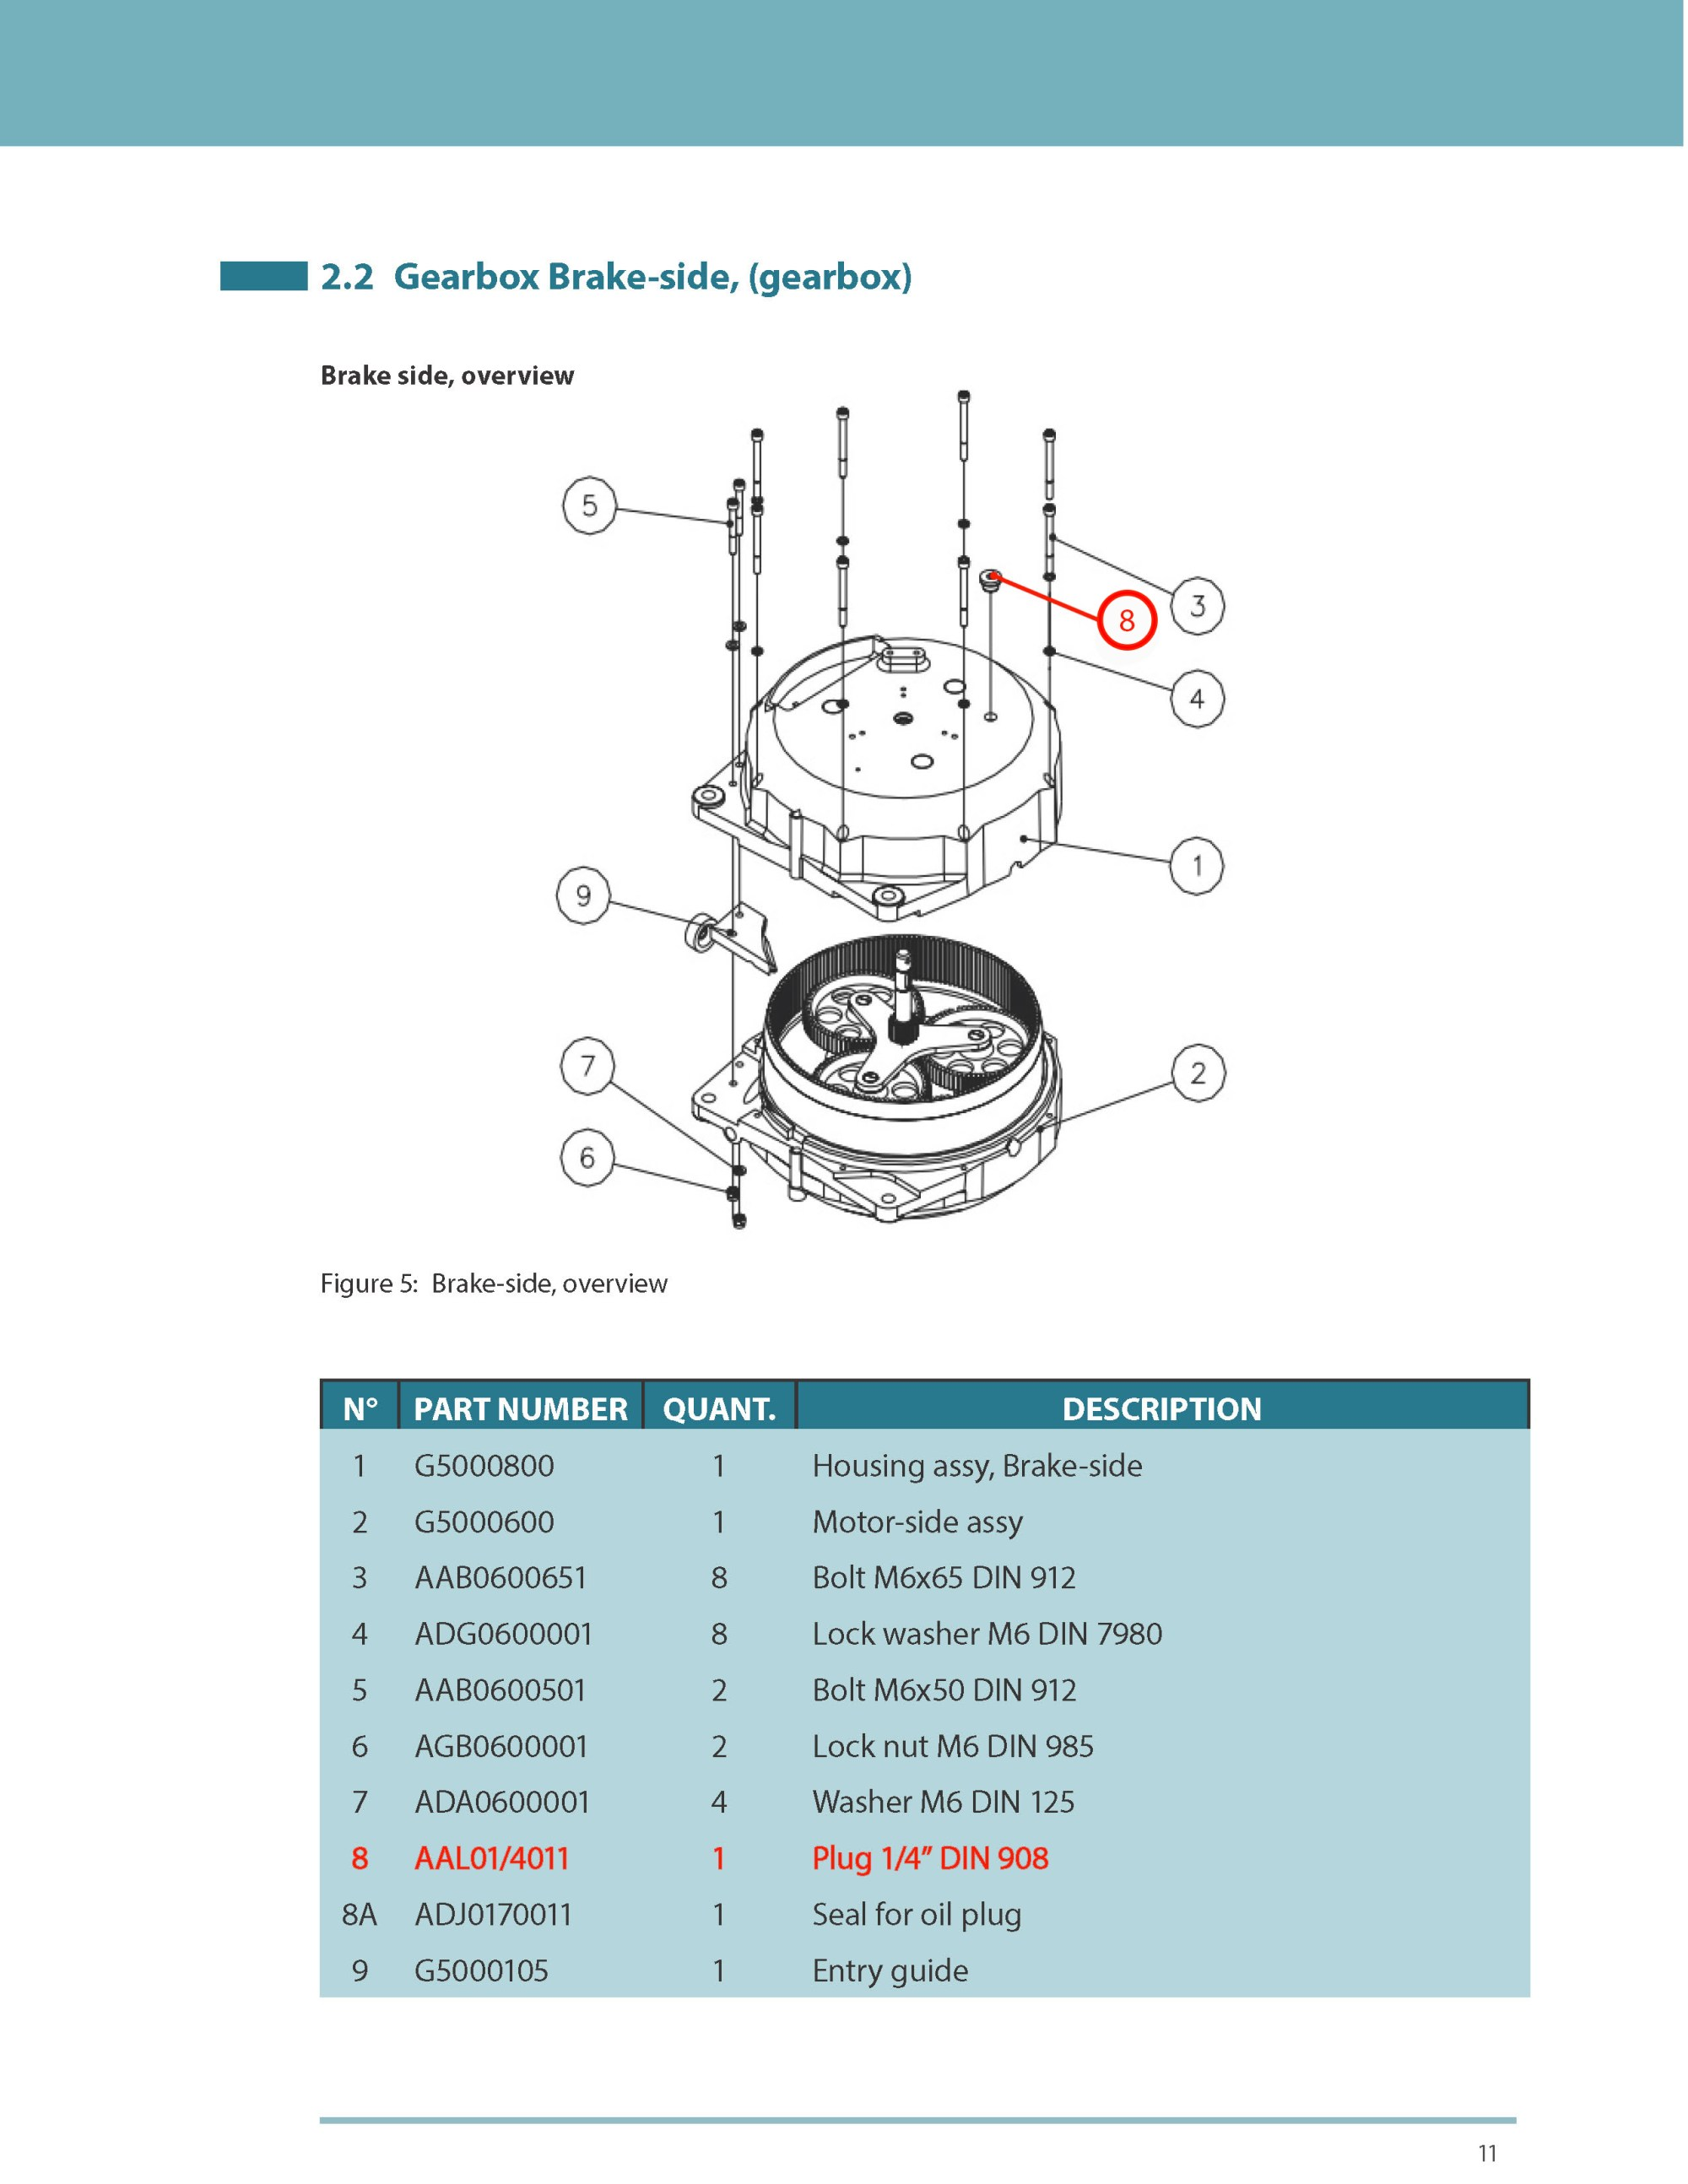 hight resolution of oil plug 1 4 din 908 zinc plated